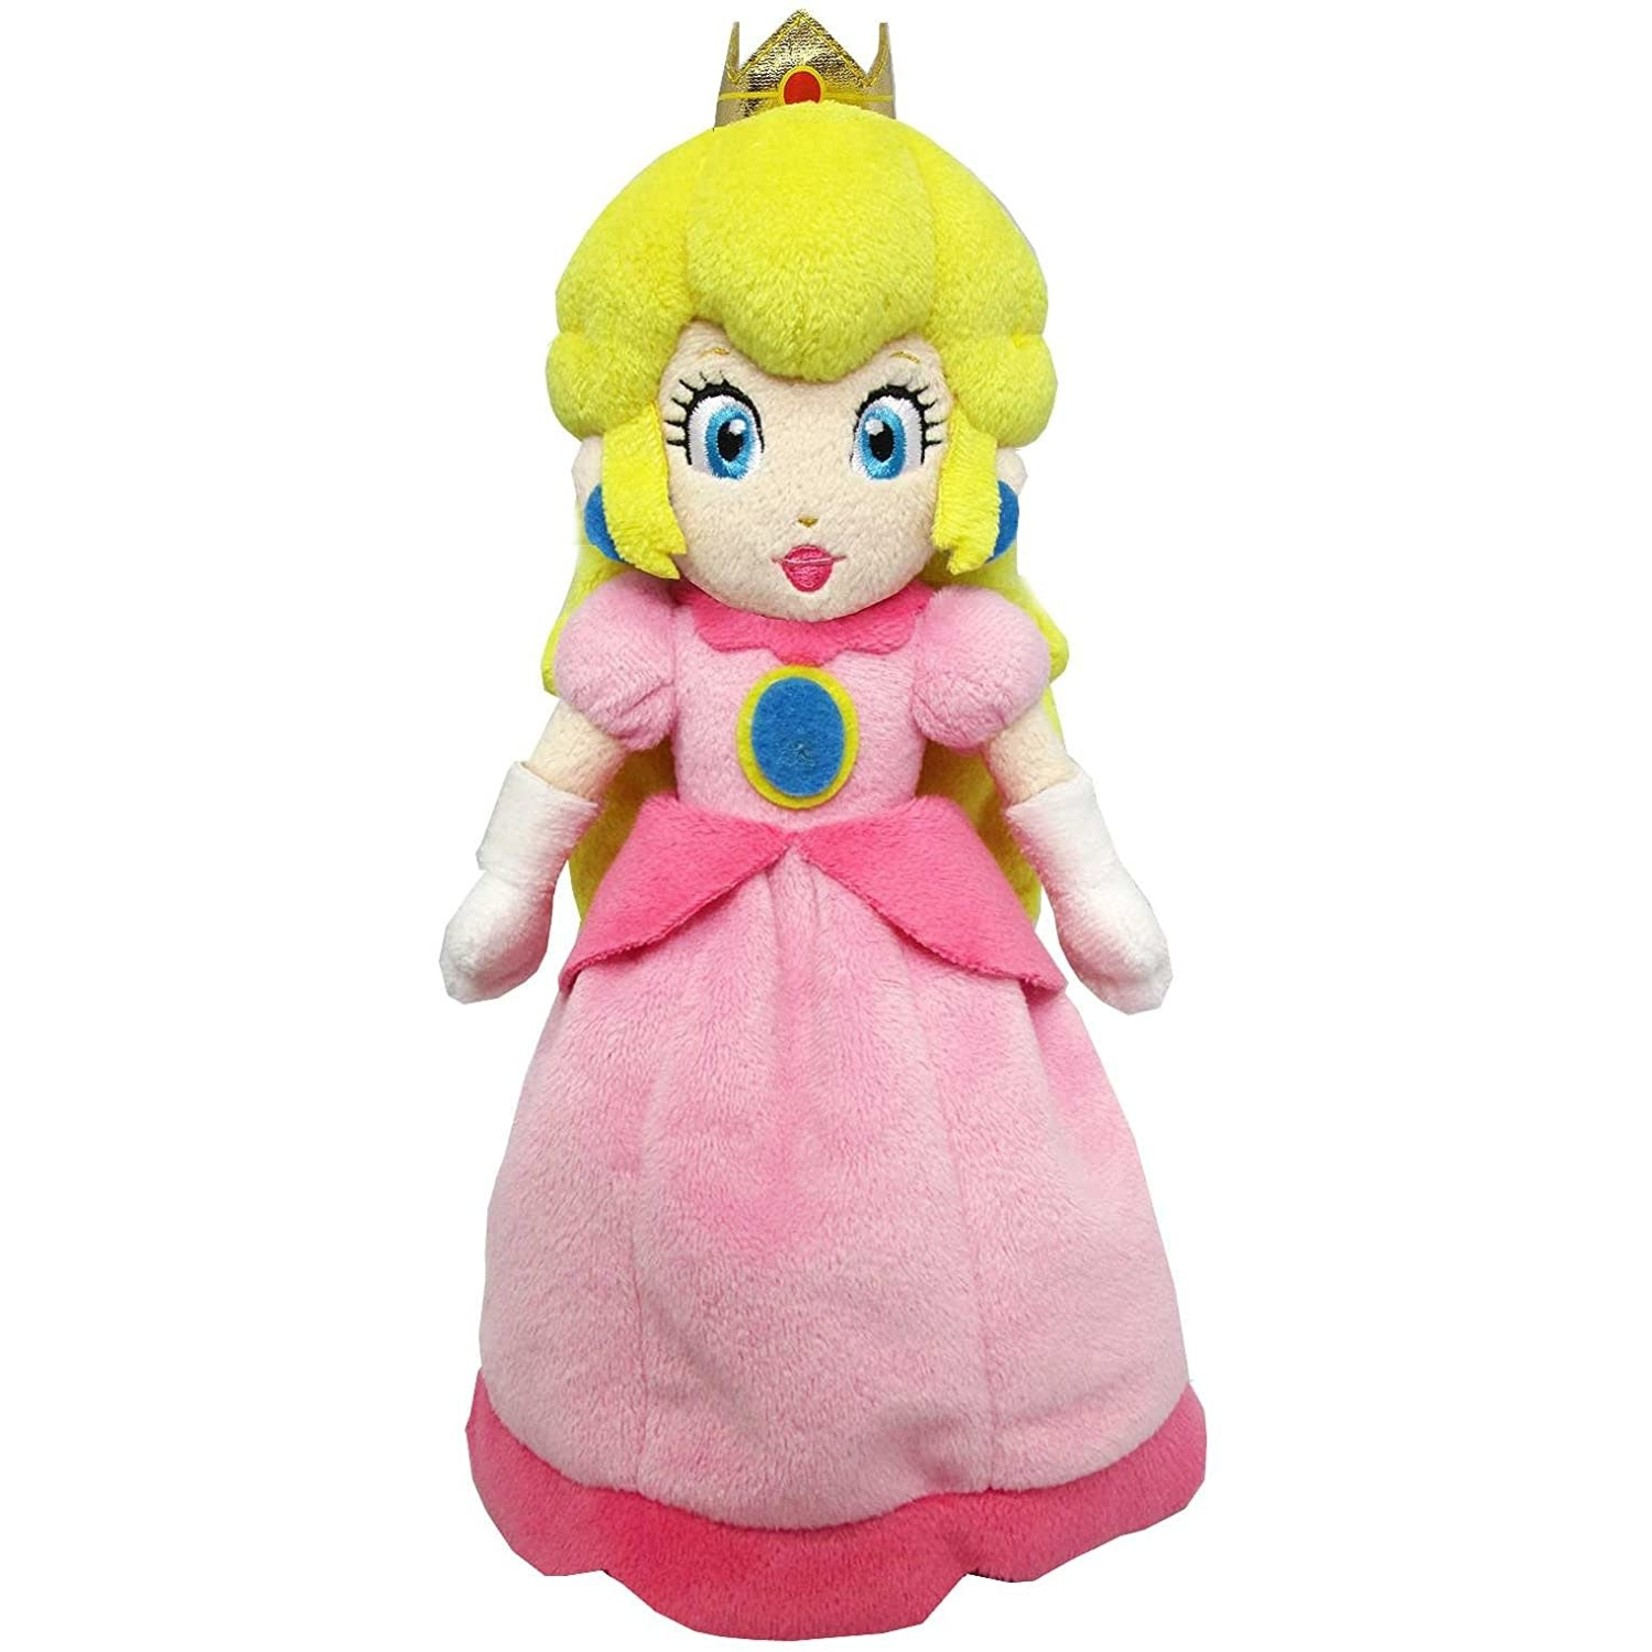 "Plush-Princess Peach 8"" Plush"